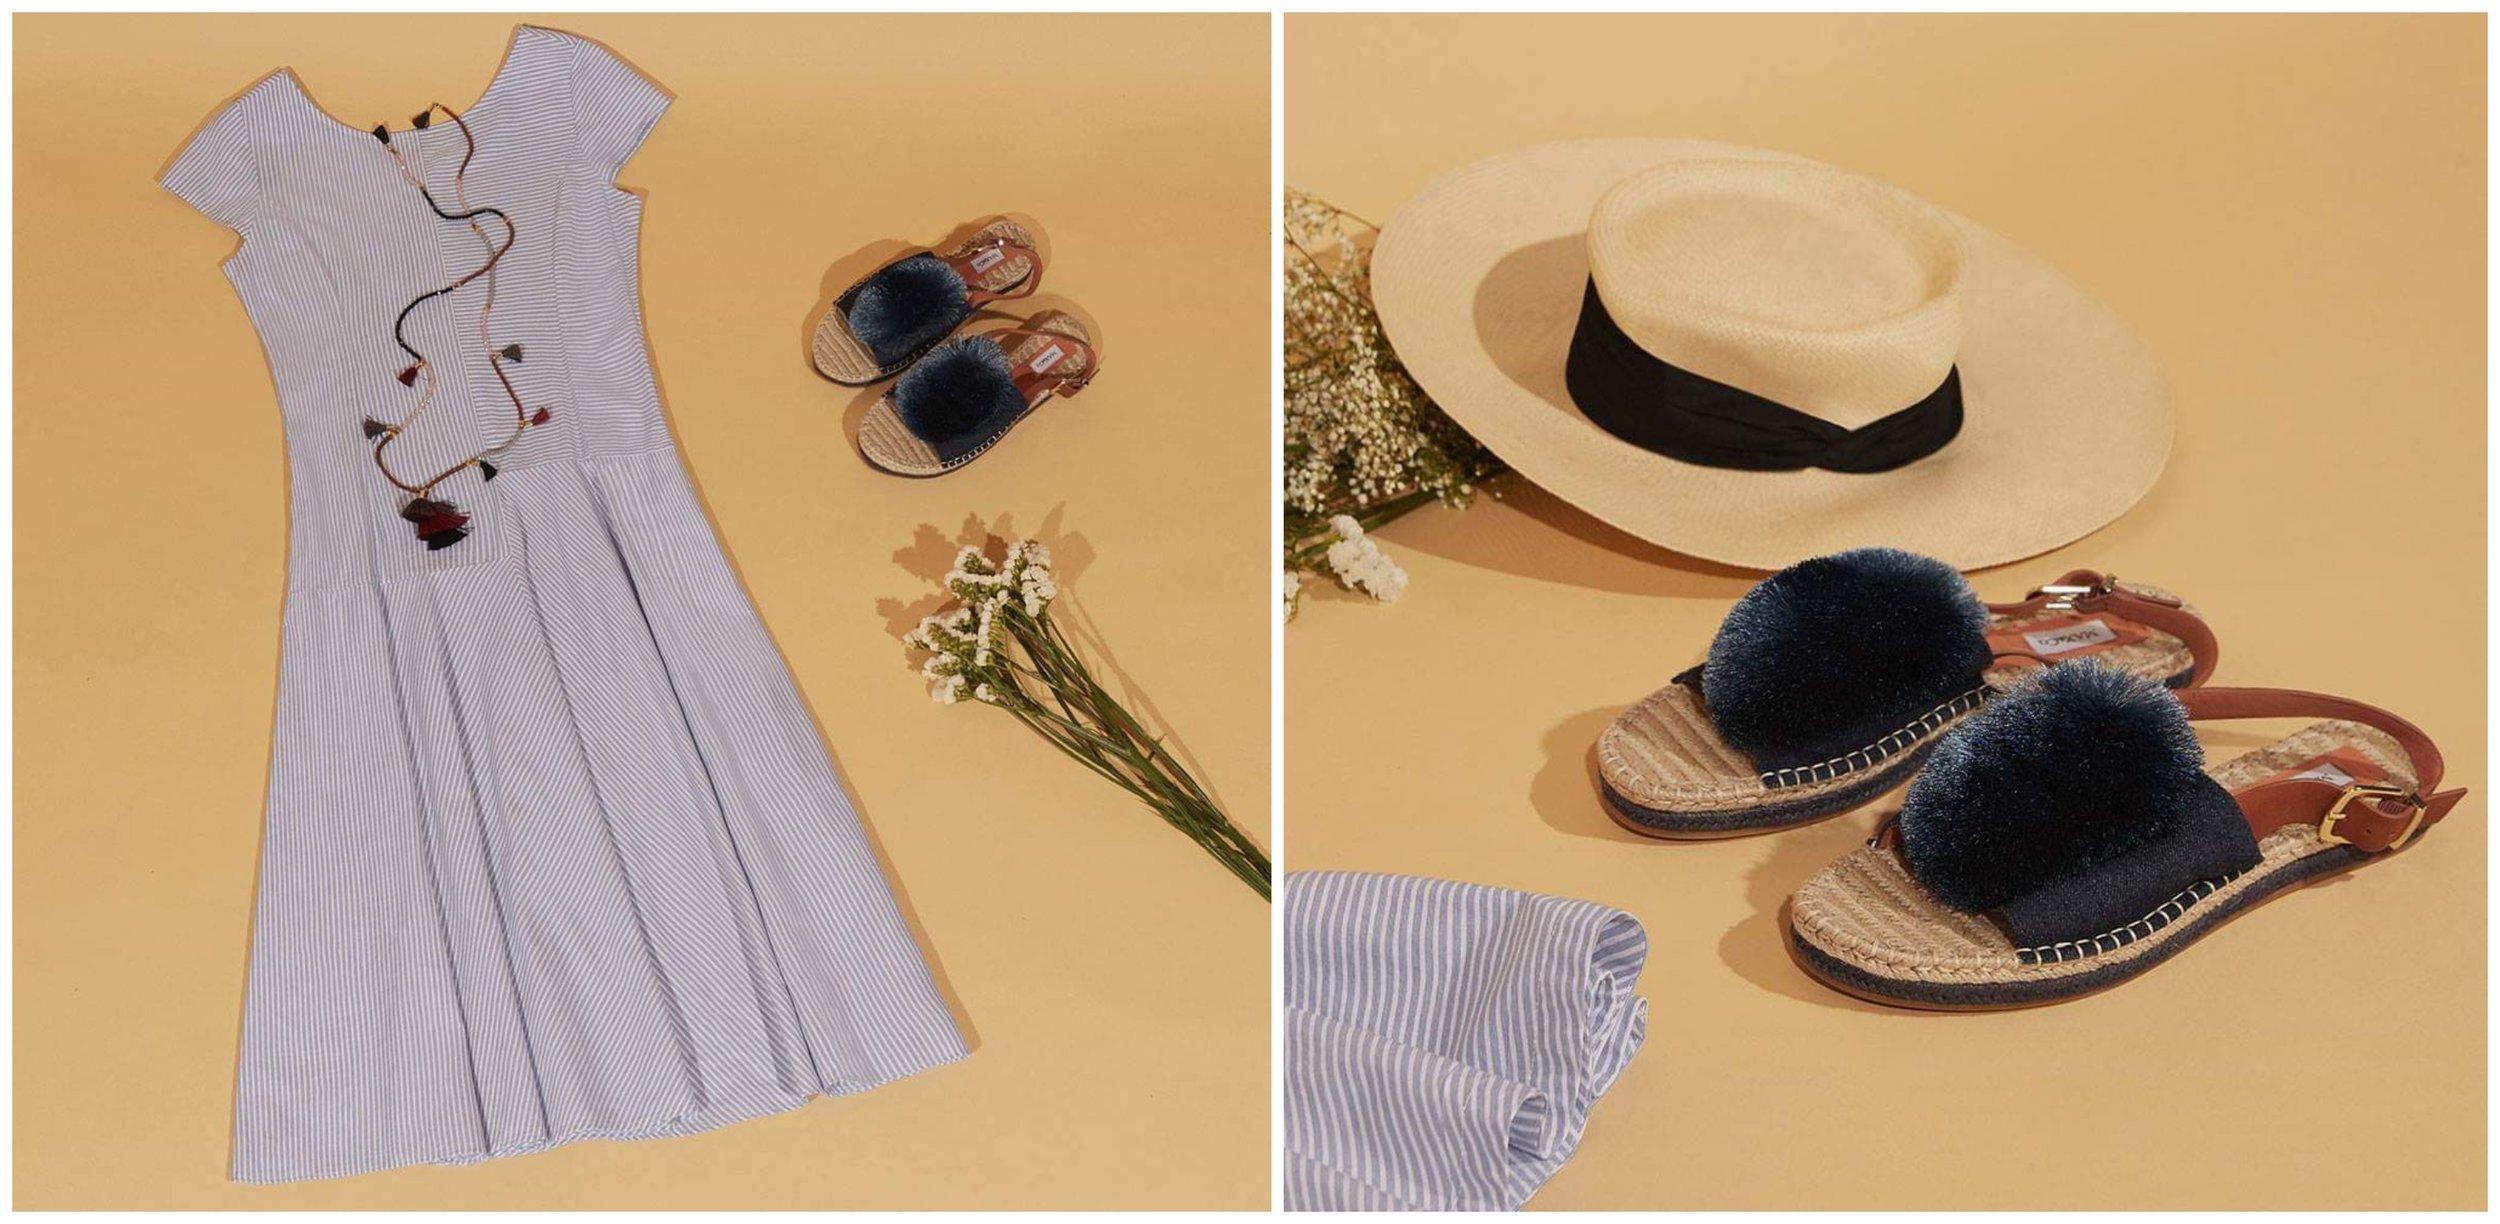 -50%, Фустан и сандали, Max&Co